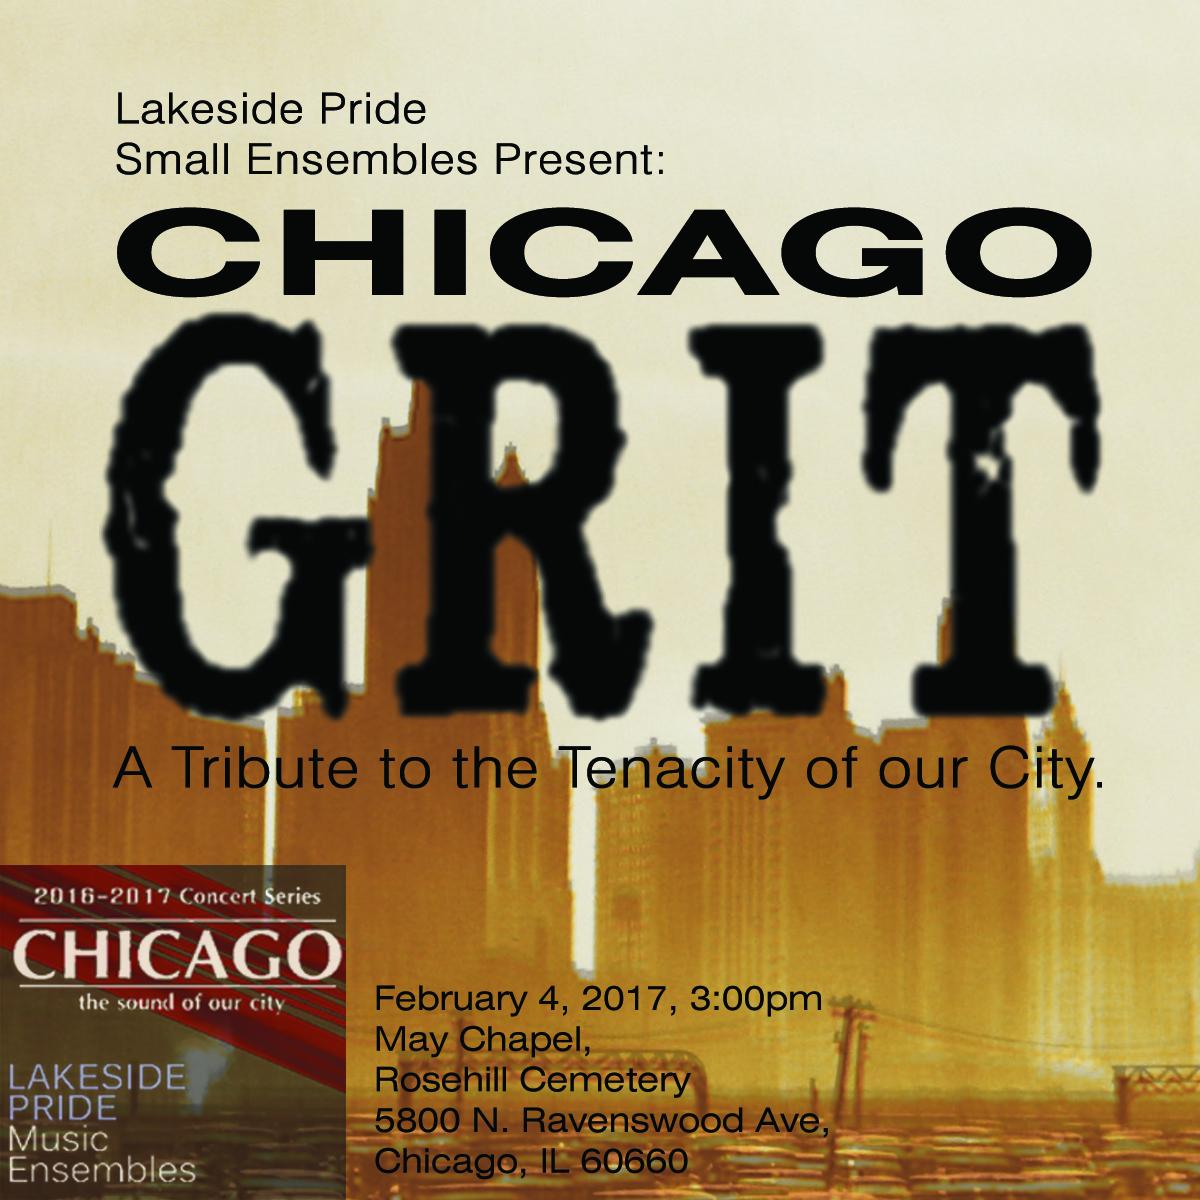 Chicago Grit concert promotional poster